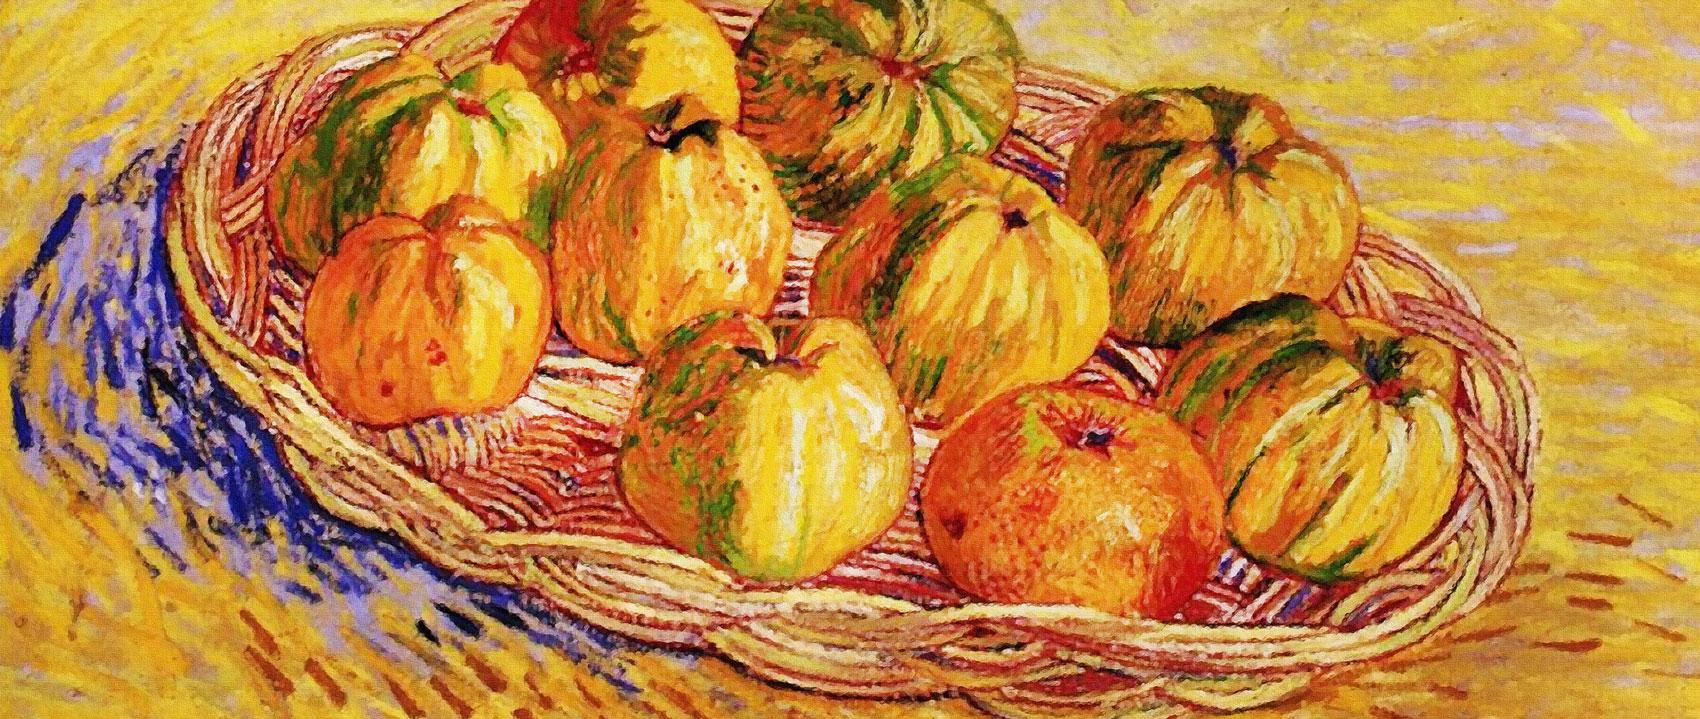 PaintBot maluje jak Van Gogh